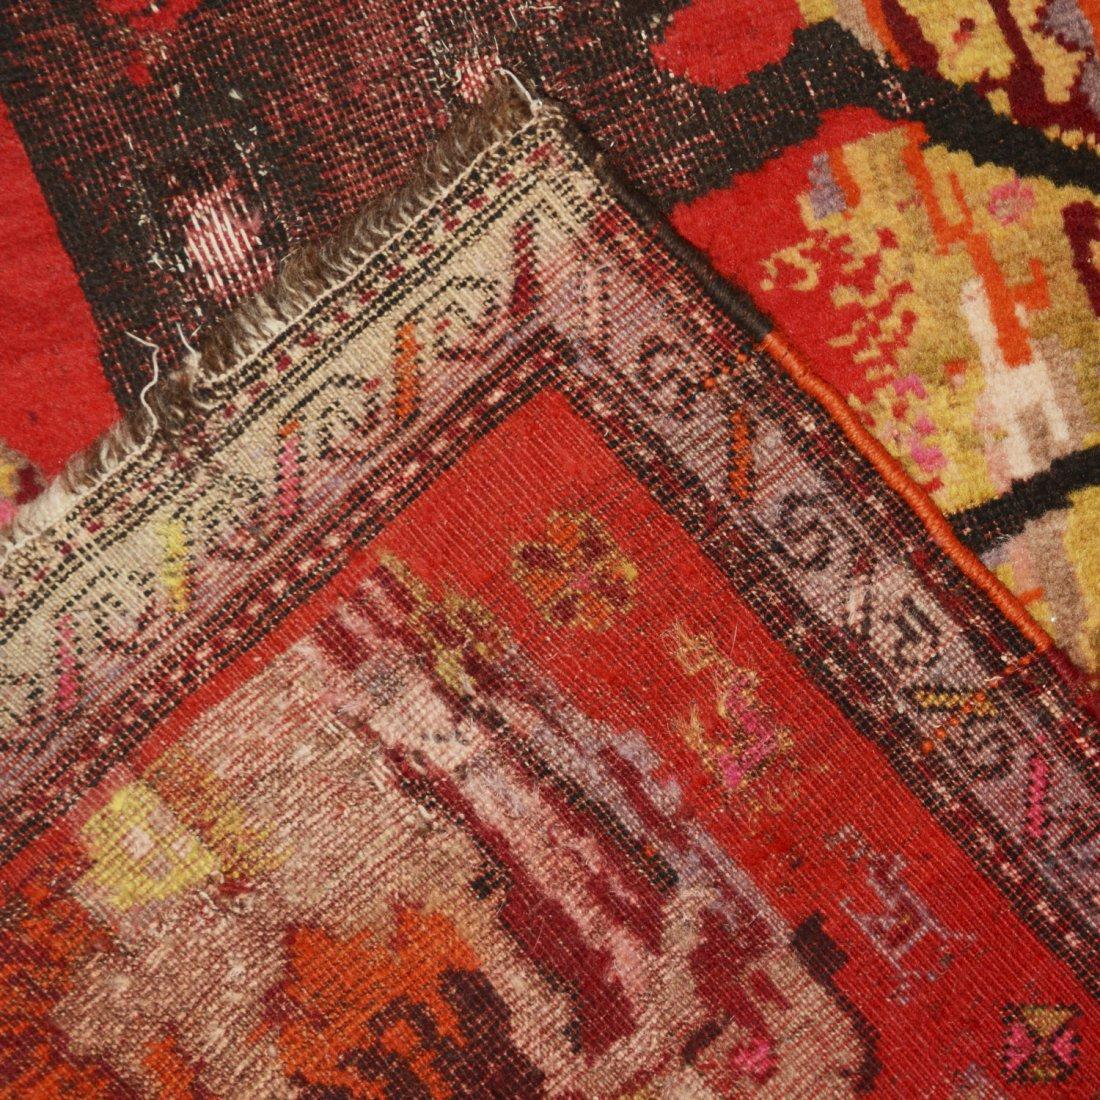 Caucasian European market rug - 7